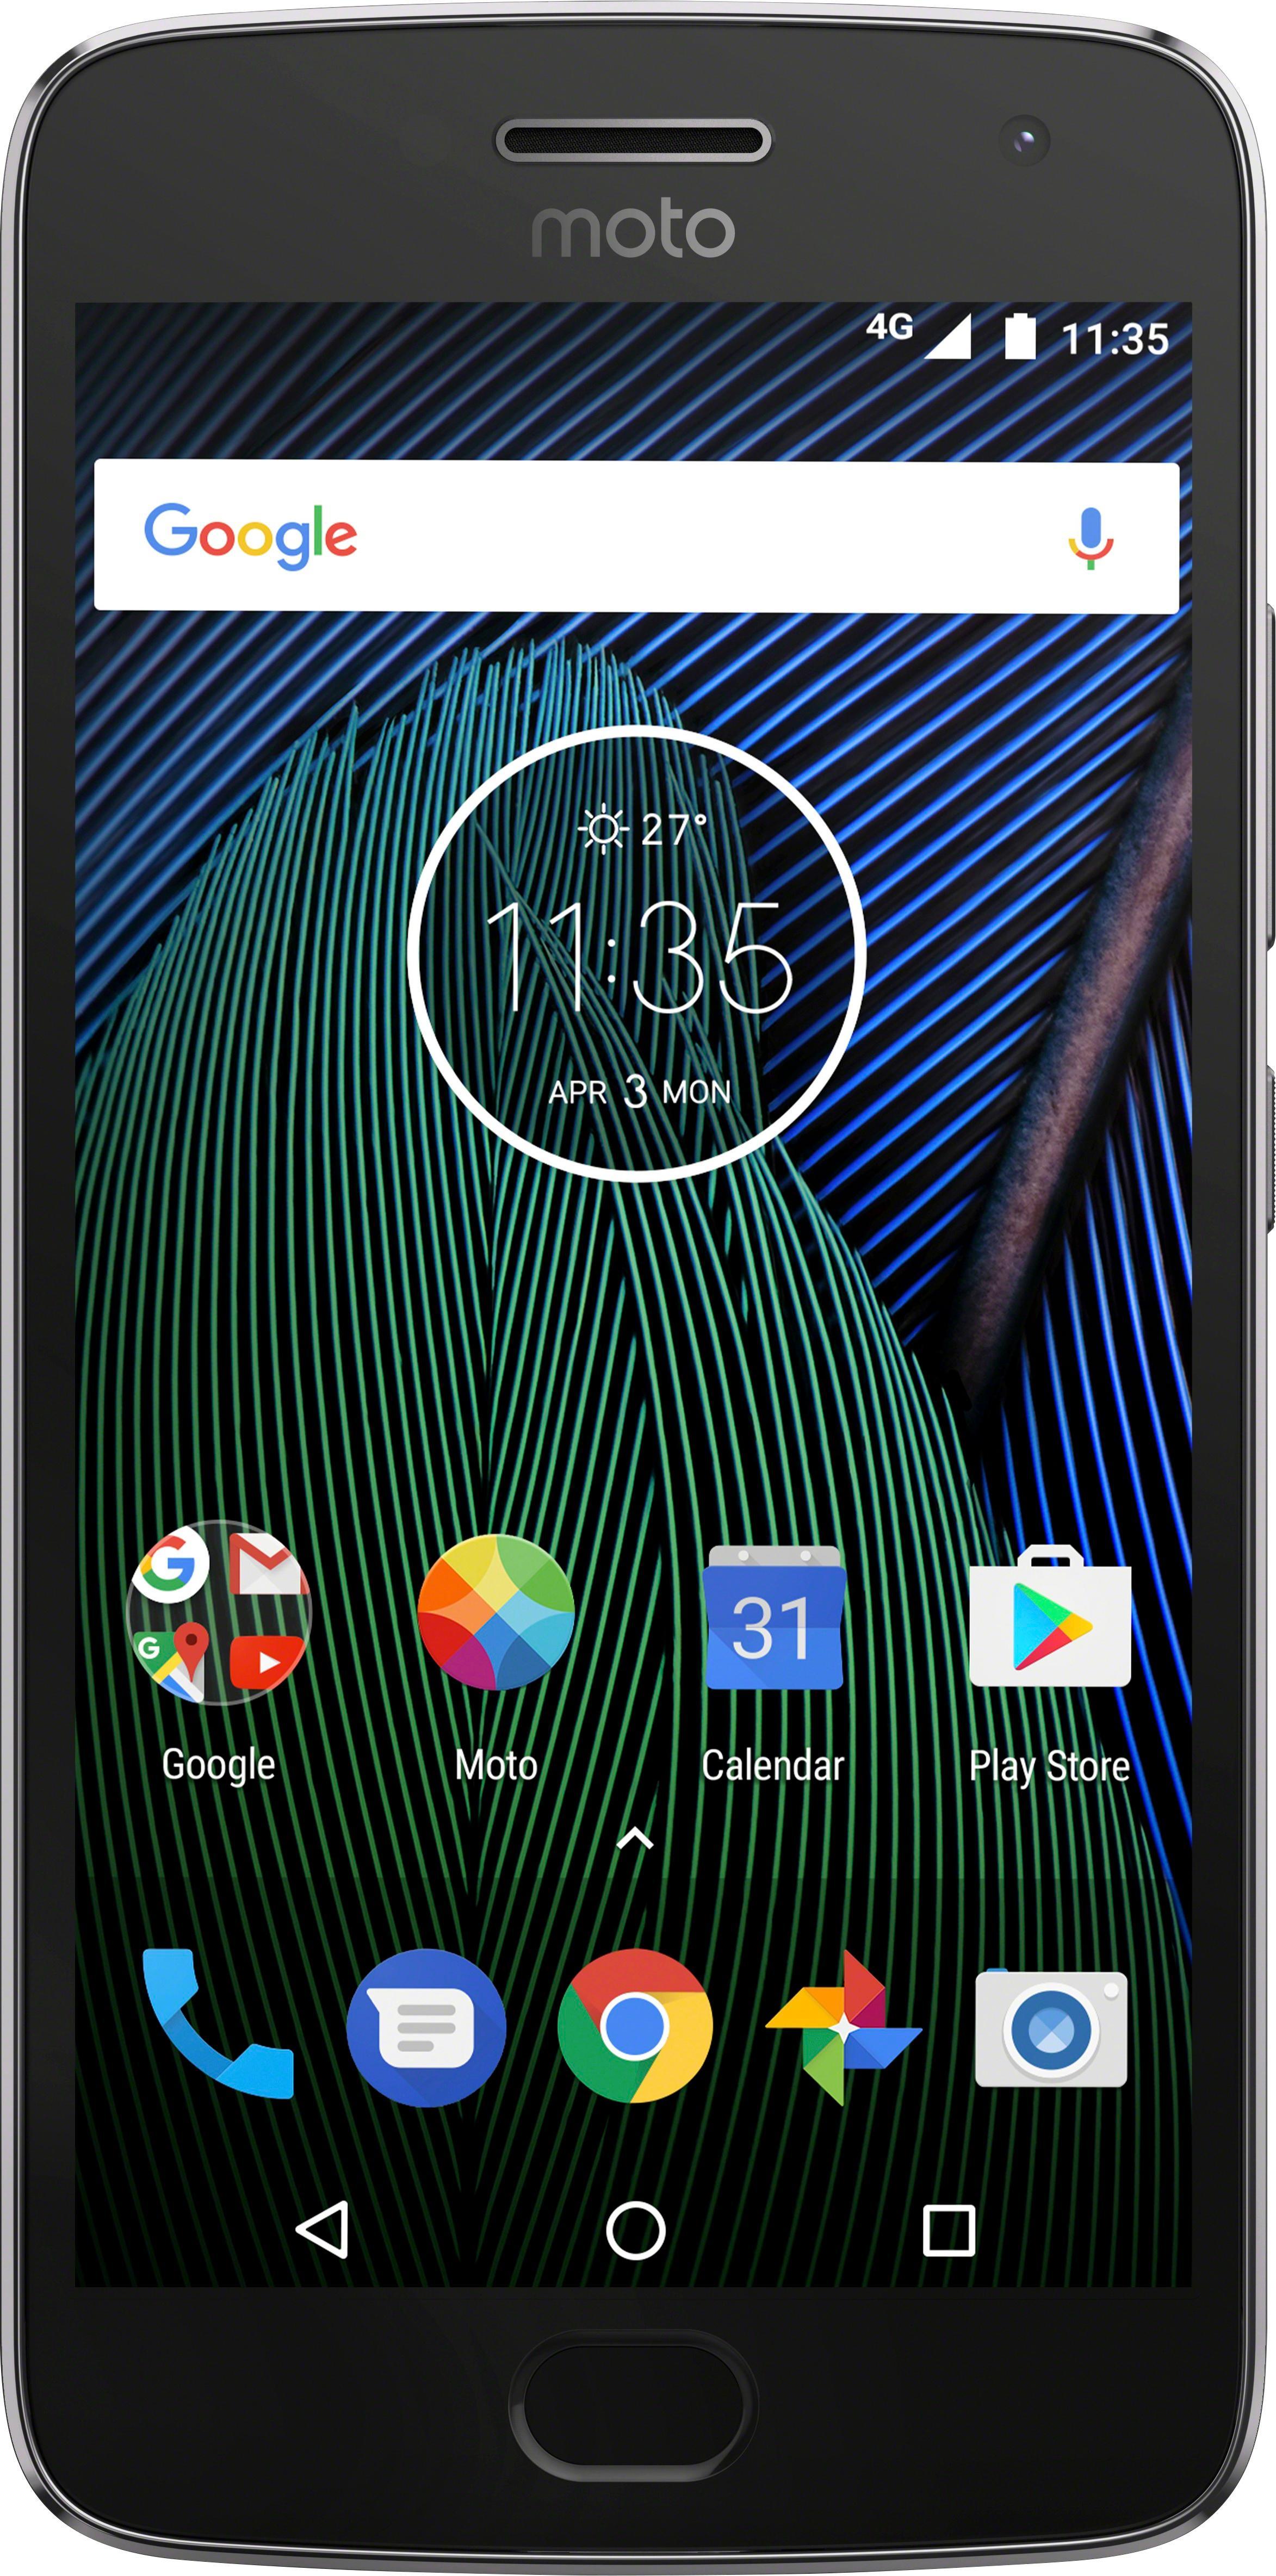 Motorola - Moto G Plus (5th Gen) 4G LTE with 32GB Memory Cell Phone (Unlocked) - Lunar Gray 5762700